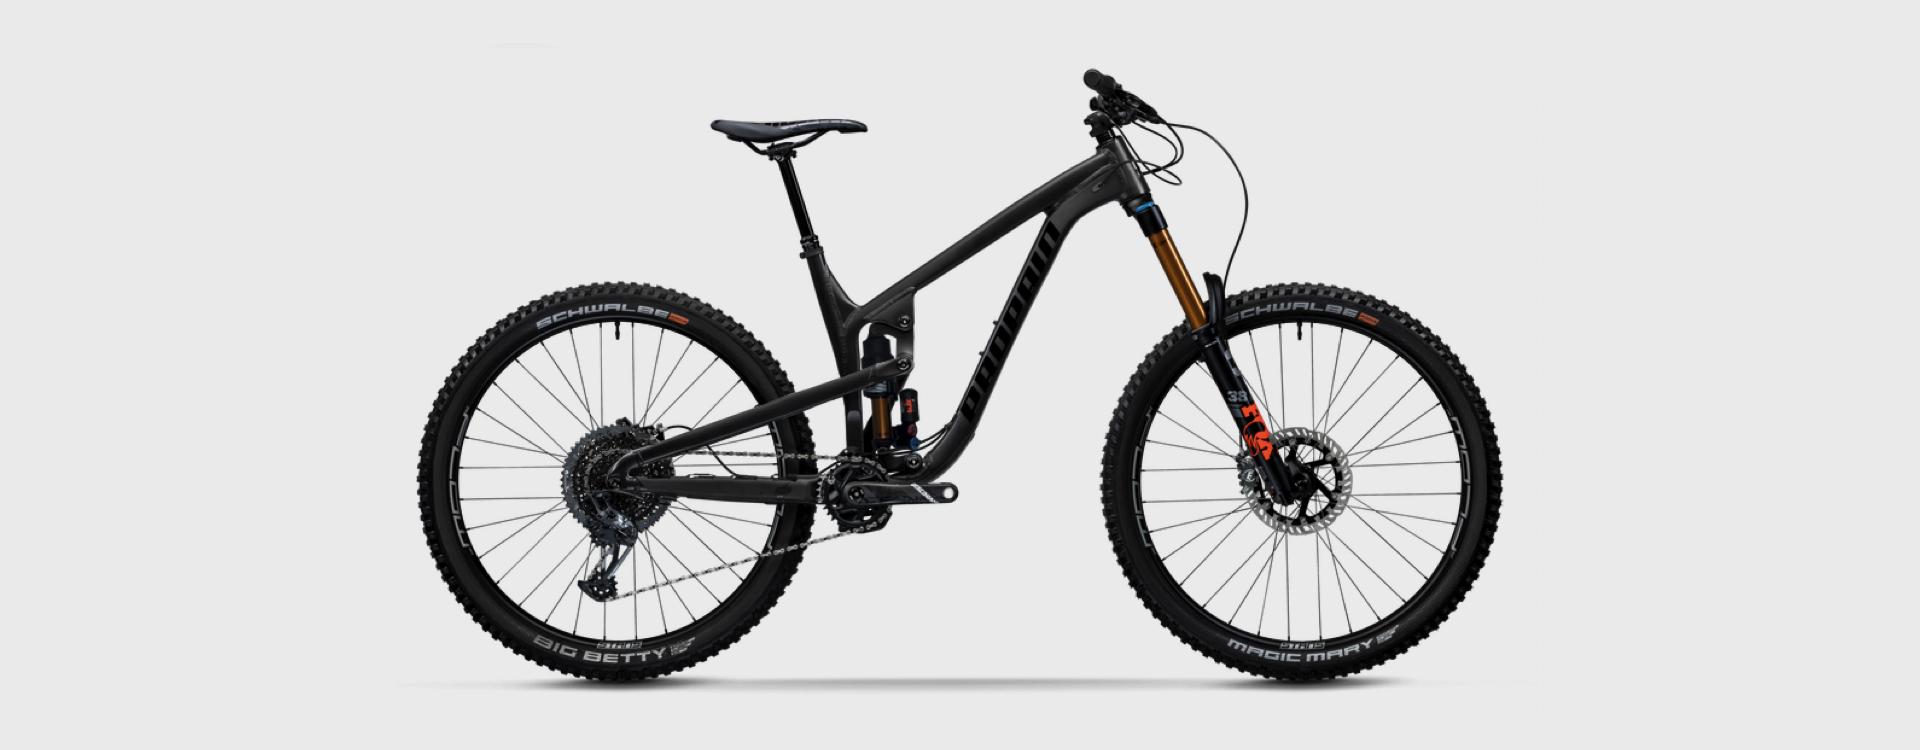 Bike Verleih Gummersbach Propain Bikes Testcenter NRW Spindrift 3 - AL - M - Mix - Black - 1920x750